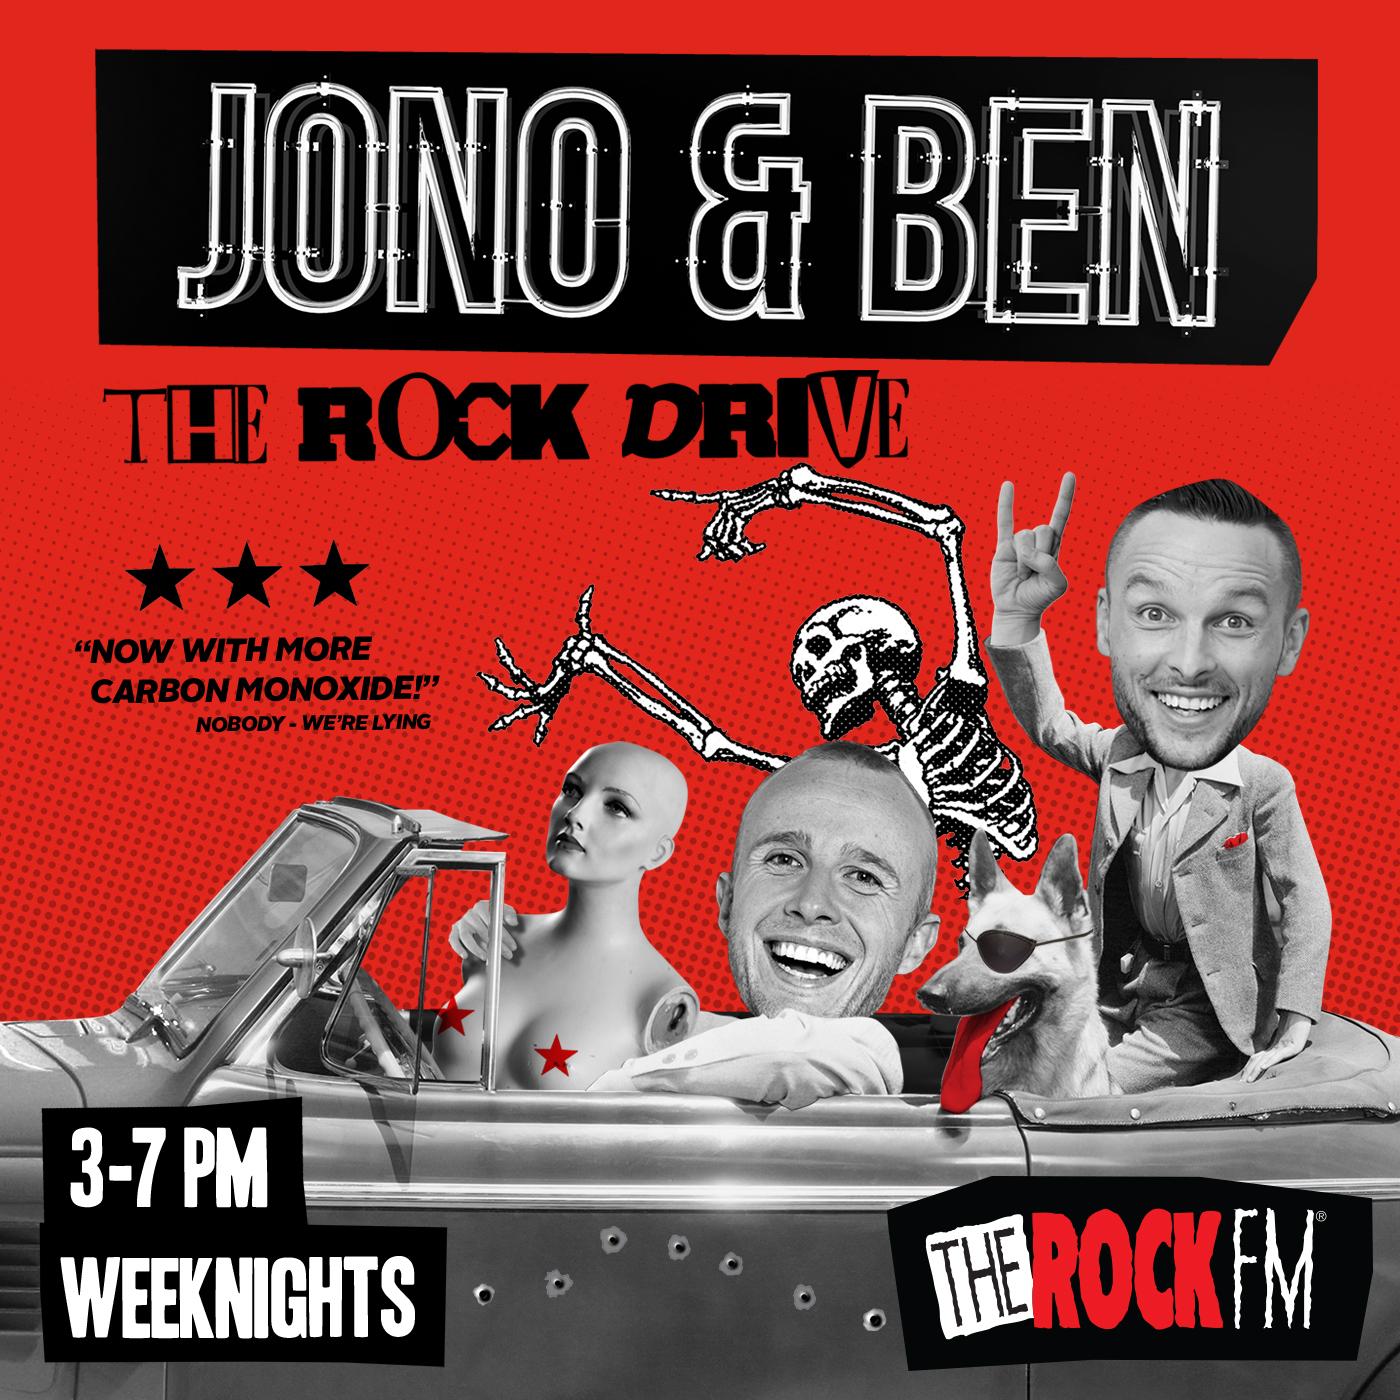 Jono & Ben - The Rock - Visit therock.net.nz for more